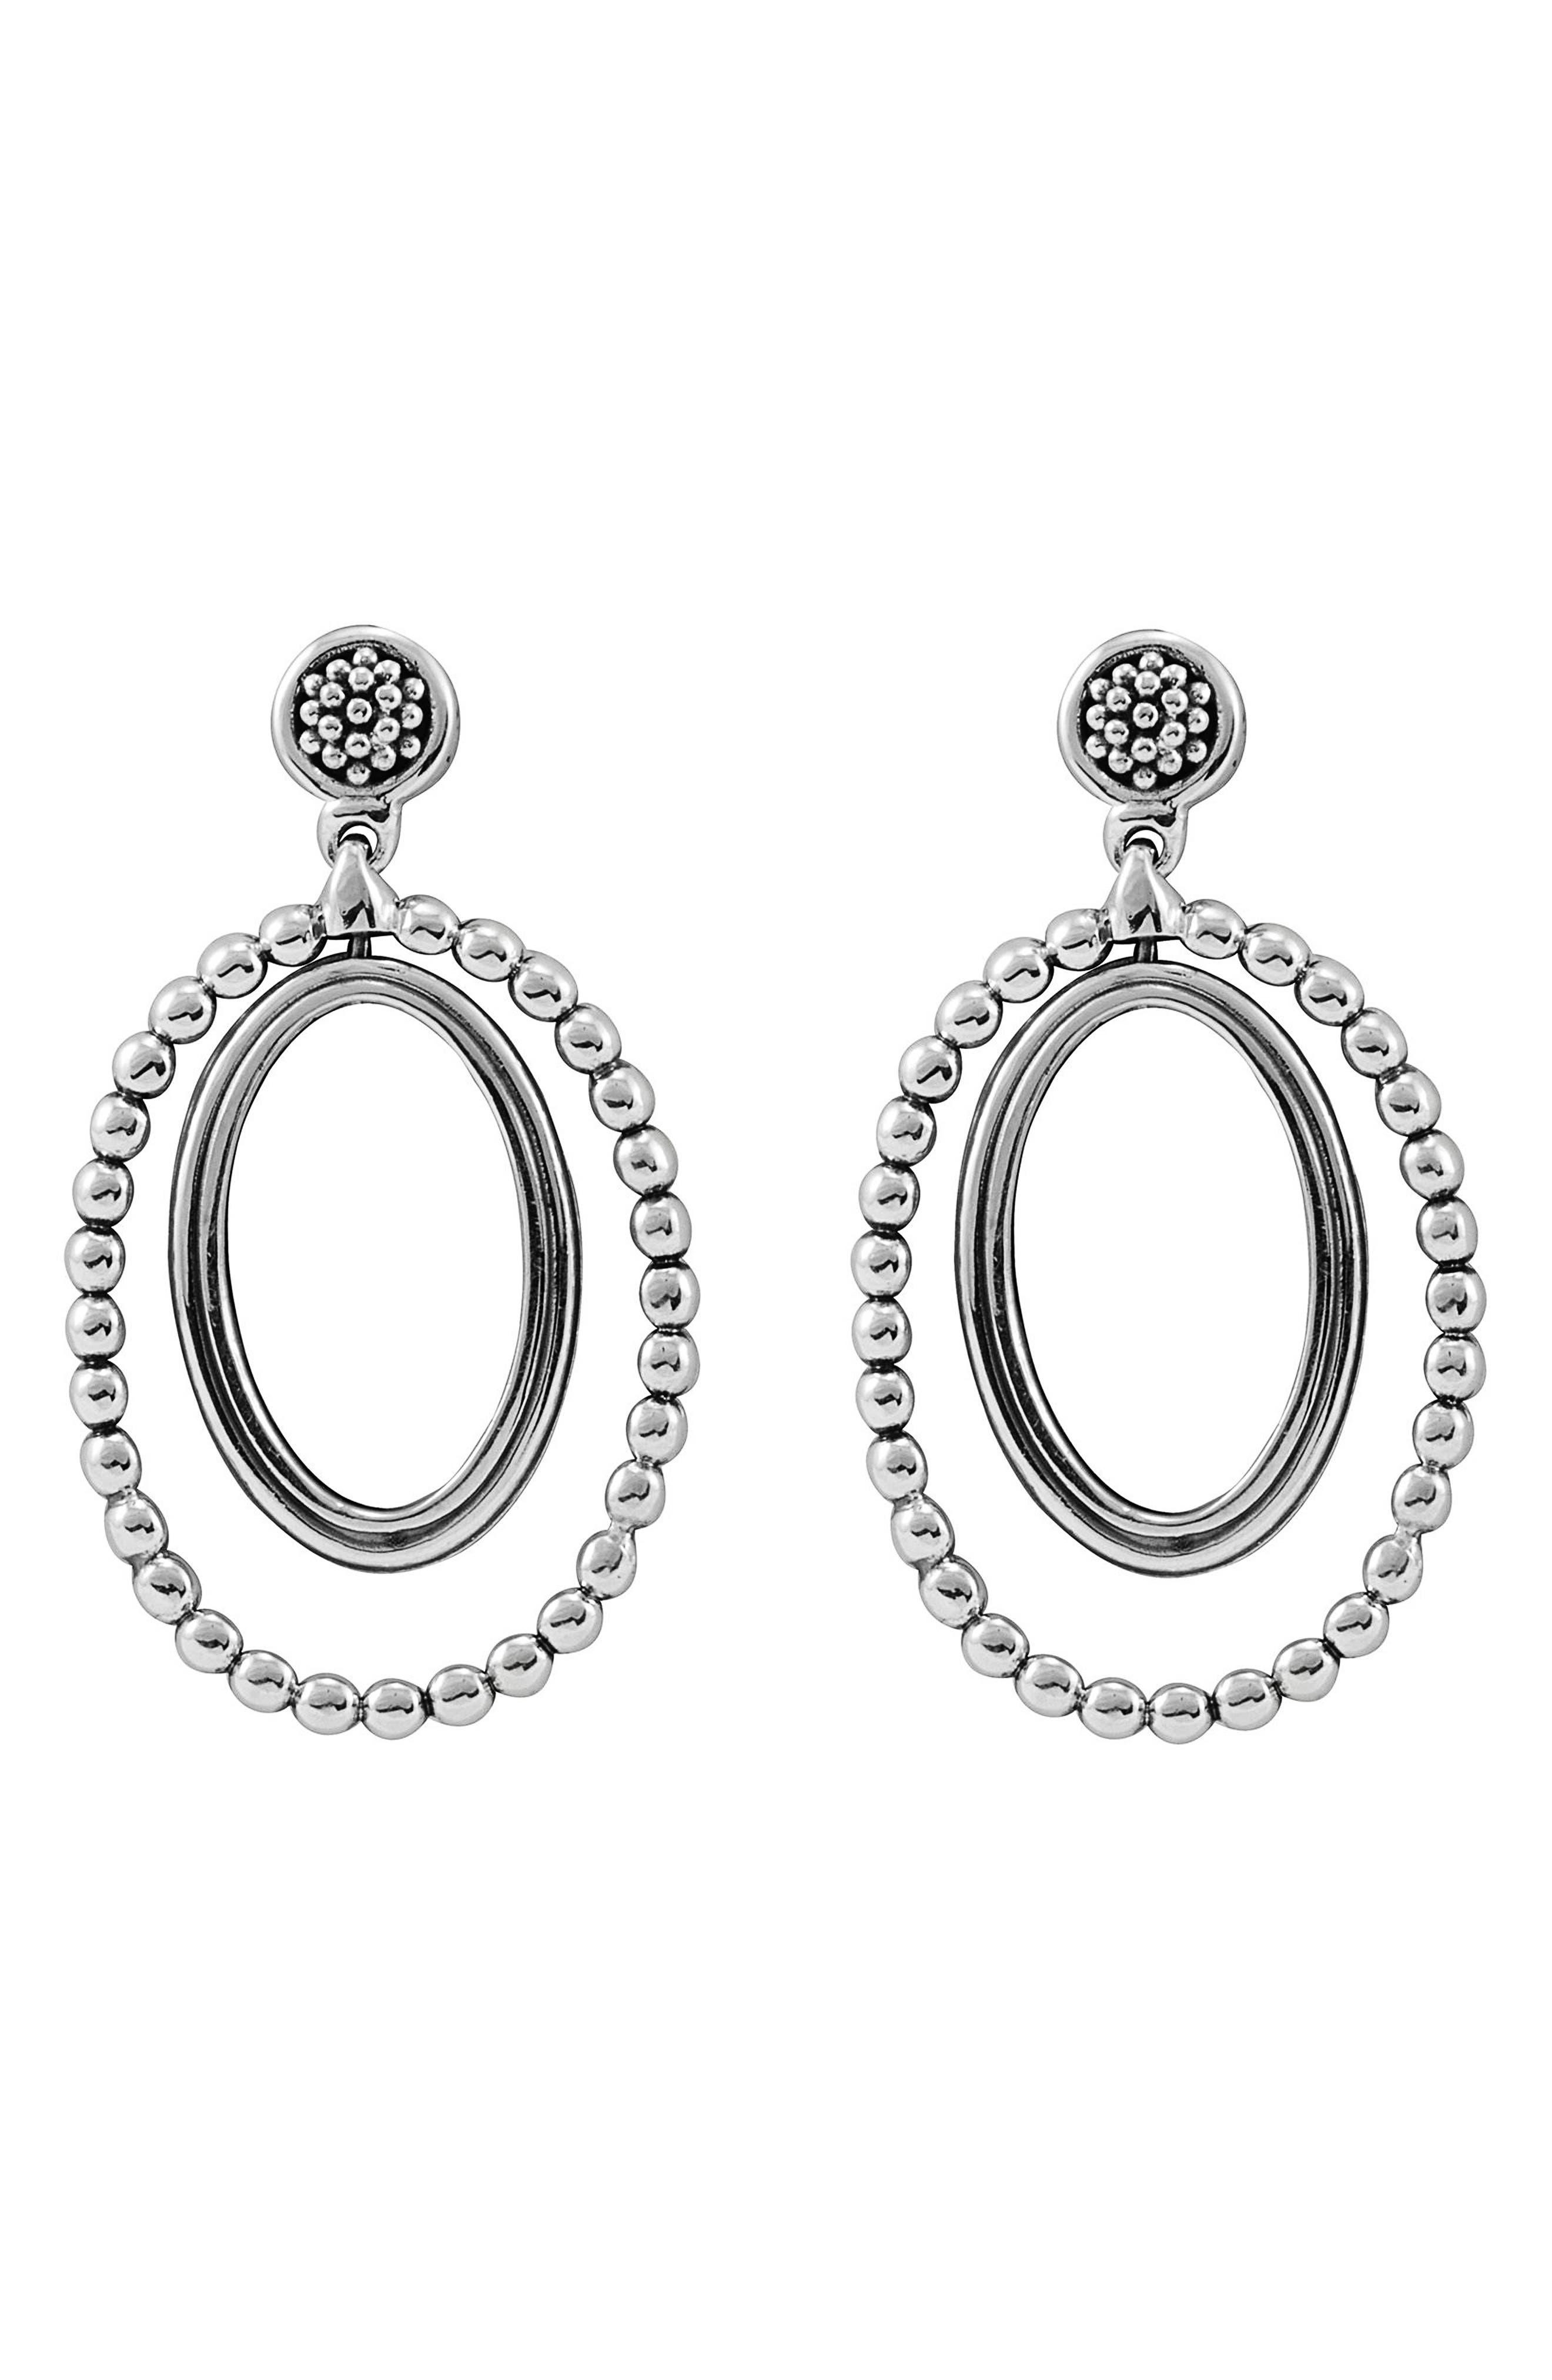 Alternate Image 1 Selected - LAGOS Caviar Oval Twist Earrings